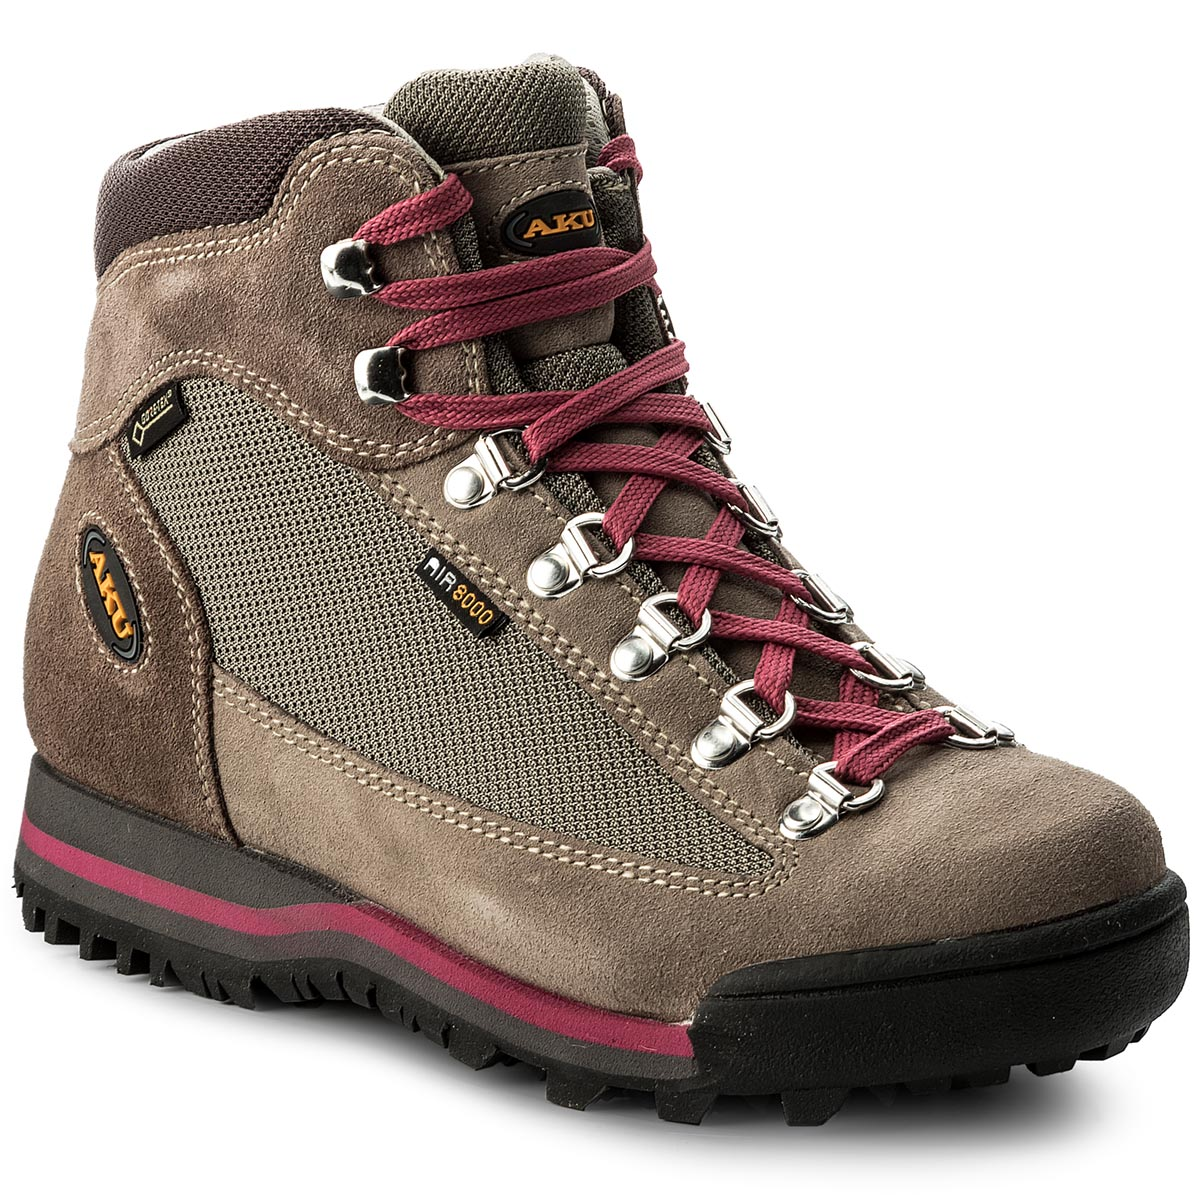 37375688 Trekker Boots AKU Ultralight Micro Gtx GORE-TEX 365.10 Sand/Strawberry 264